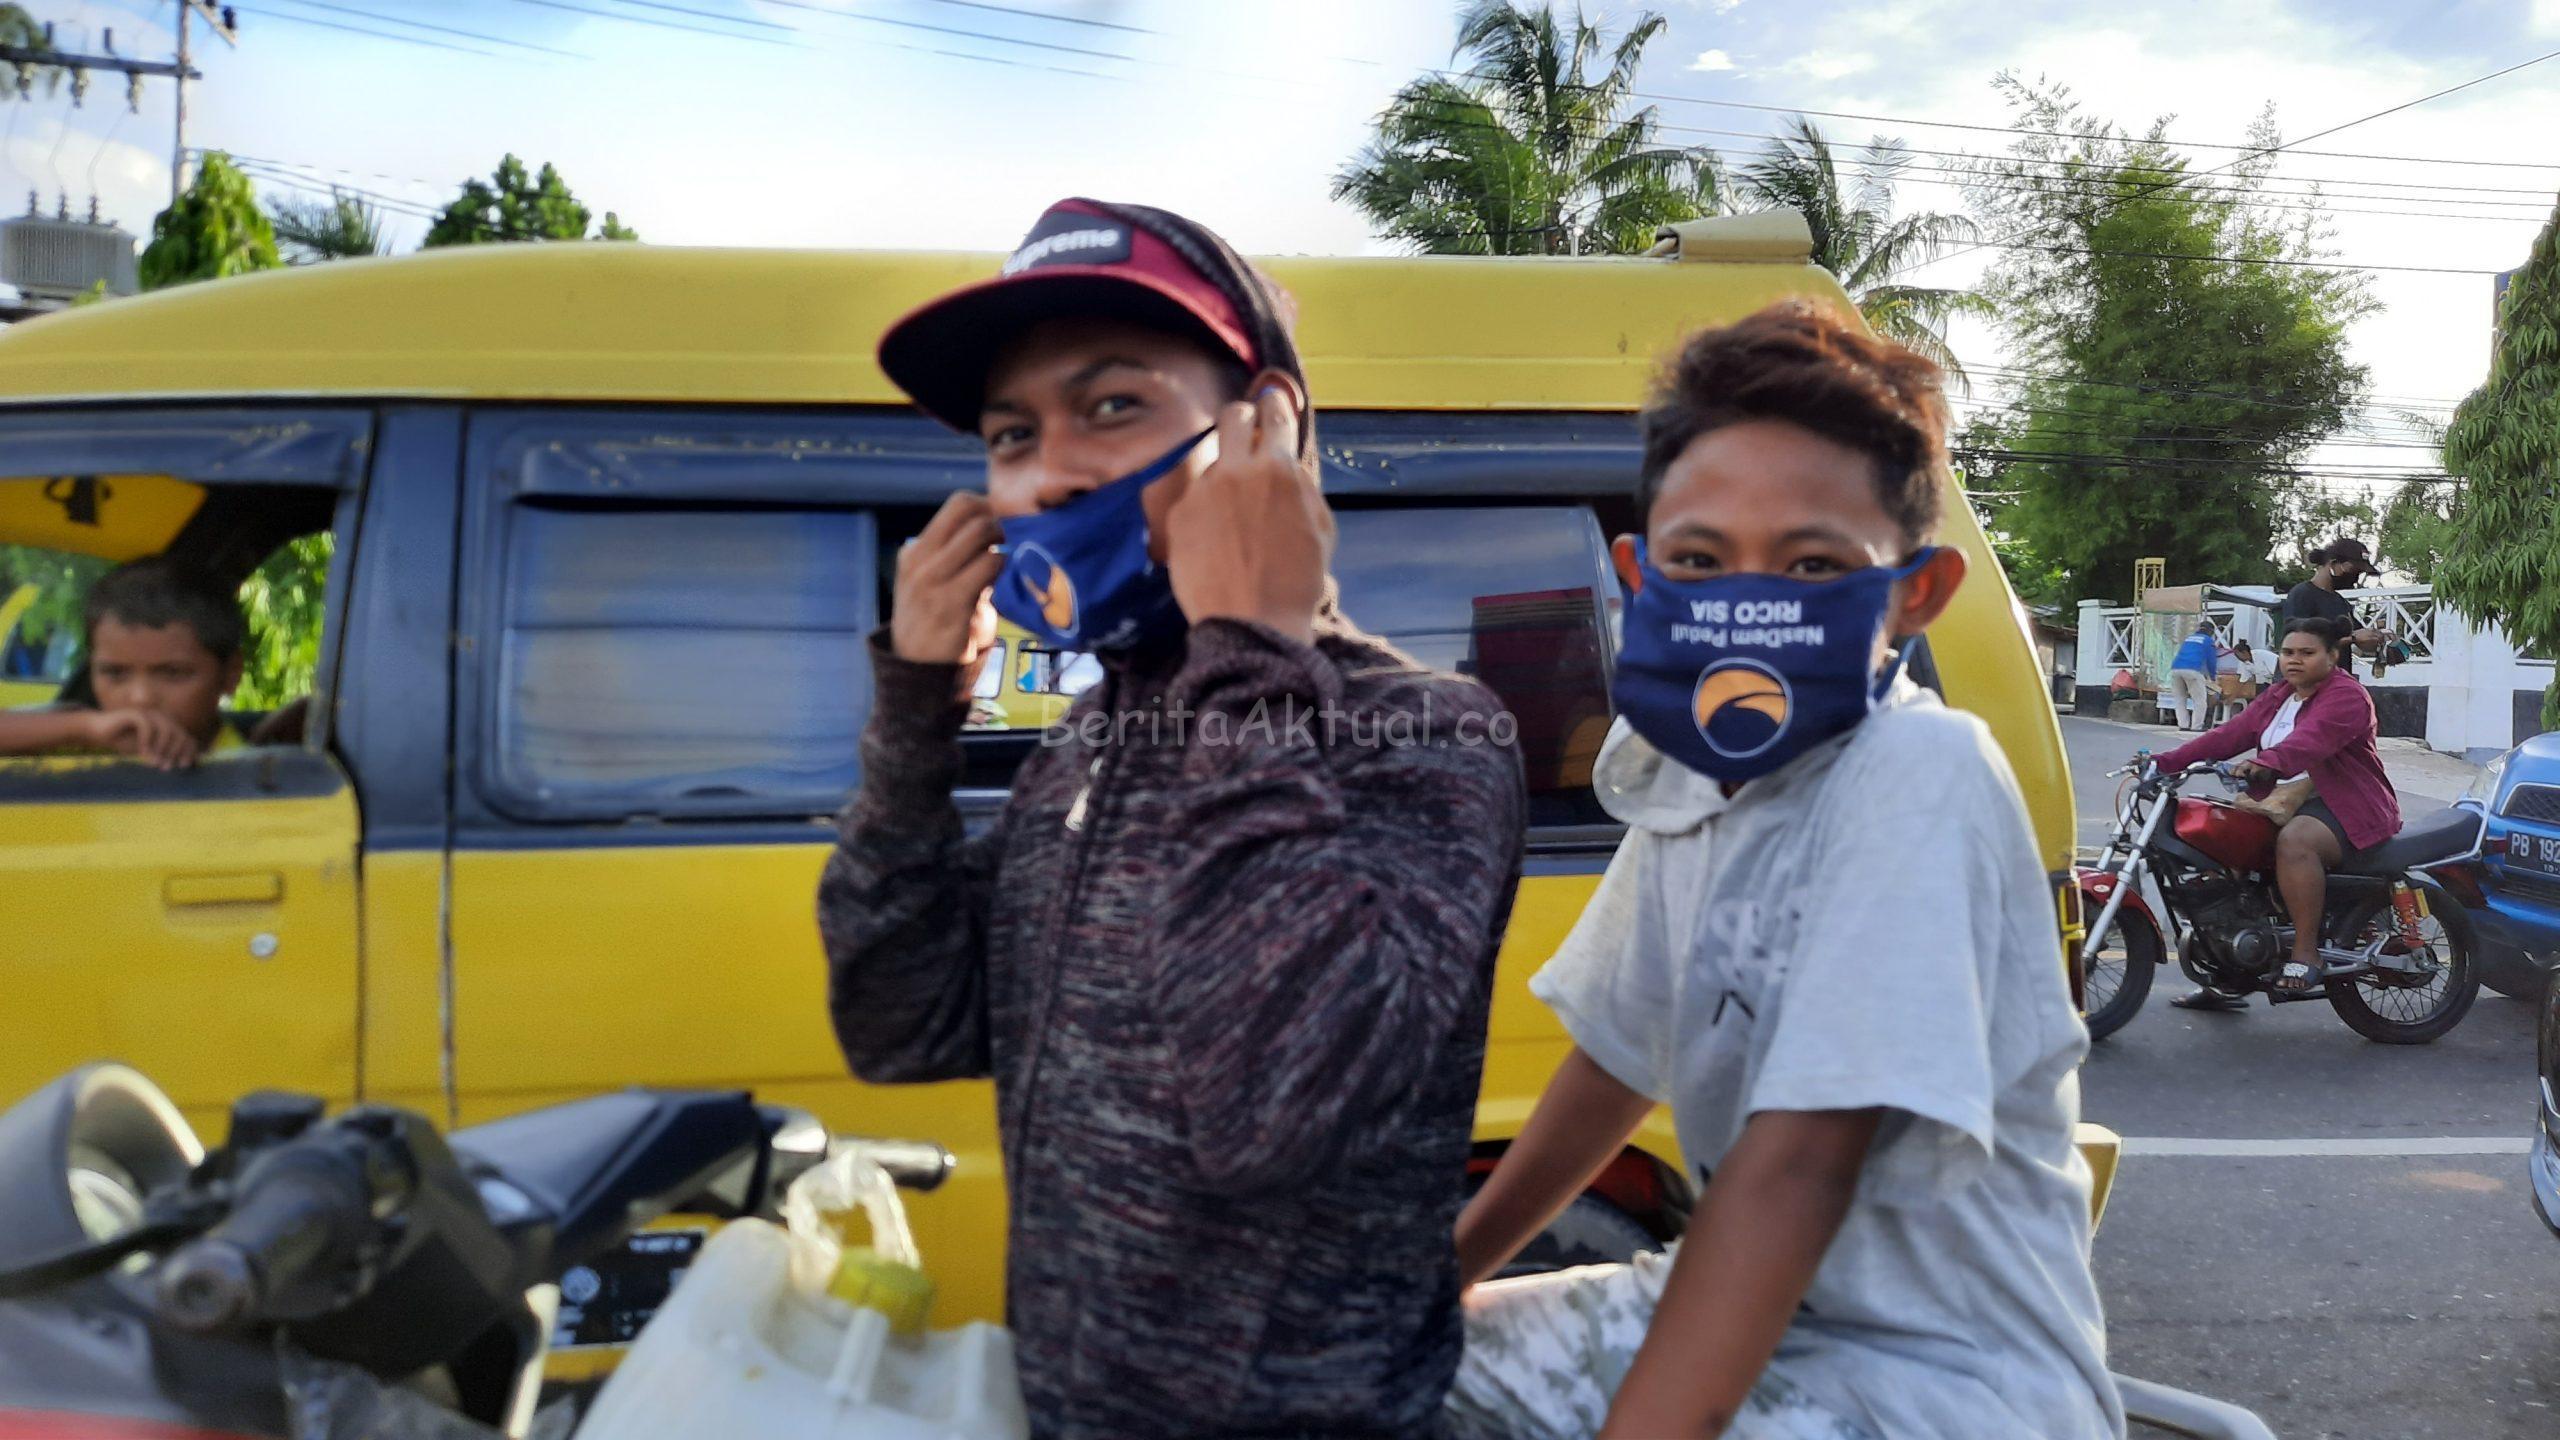 Peduli Corona, Partai NasDem Dan Sahabat Rico Sia Bagi APD Serta Takjil di Terminal Kota Sorong 3 20200503 171024 scaled